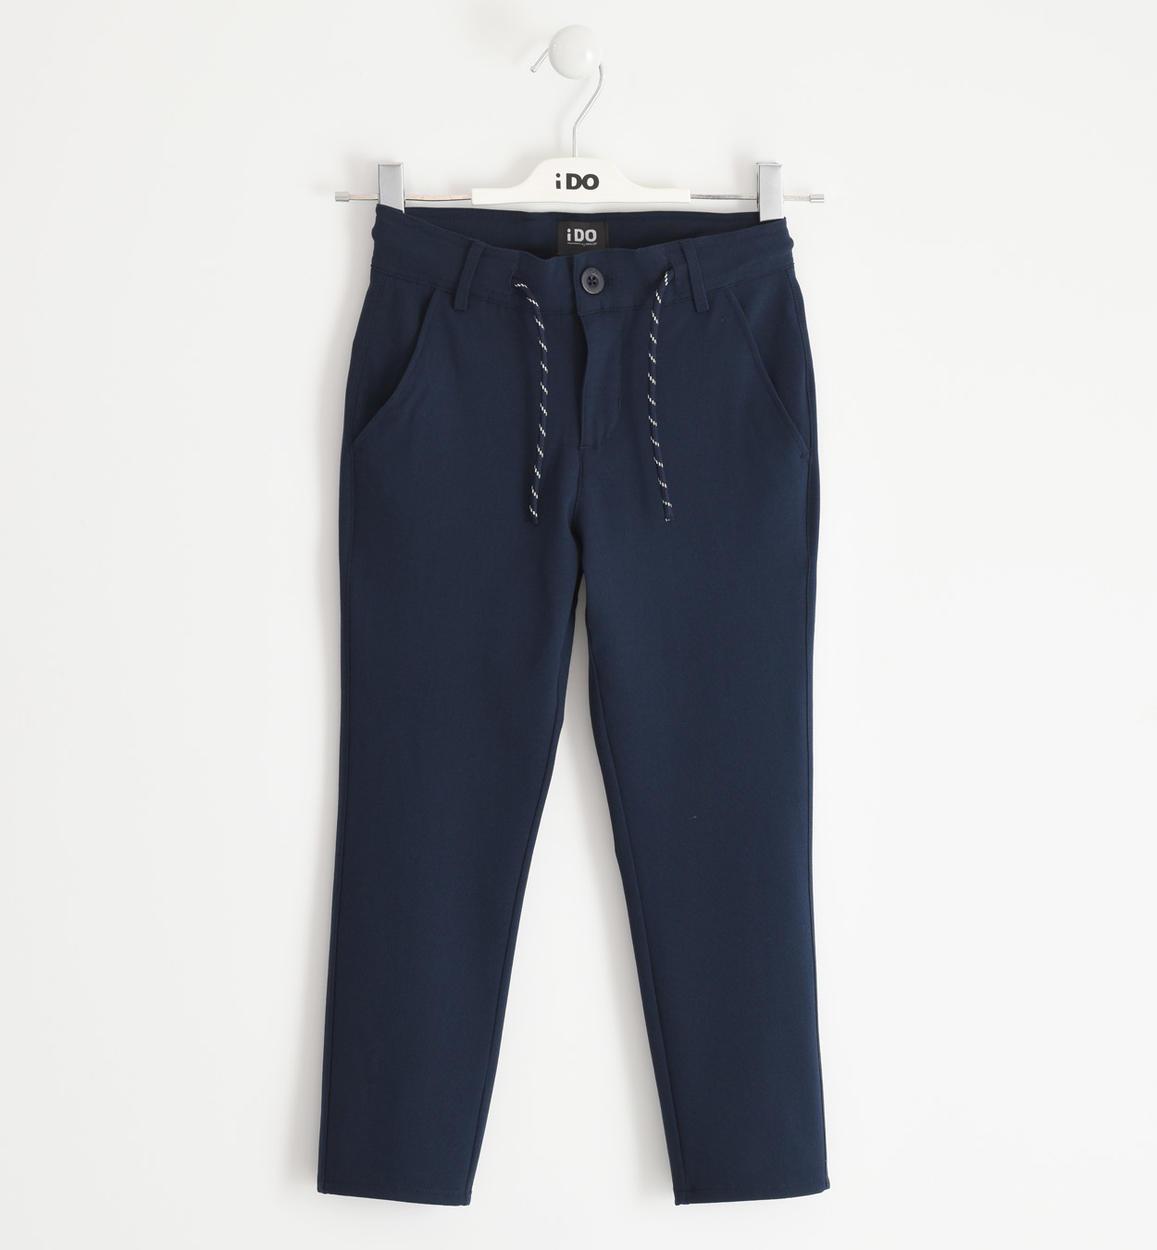 pantalone modello carrot fit per bambino navy fronte 01 2524j43300 3885